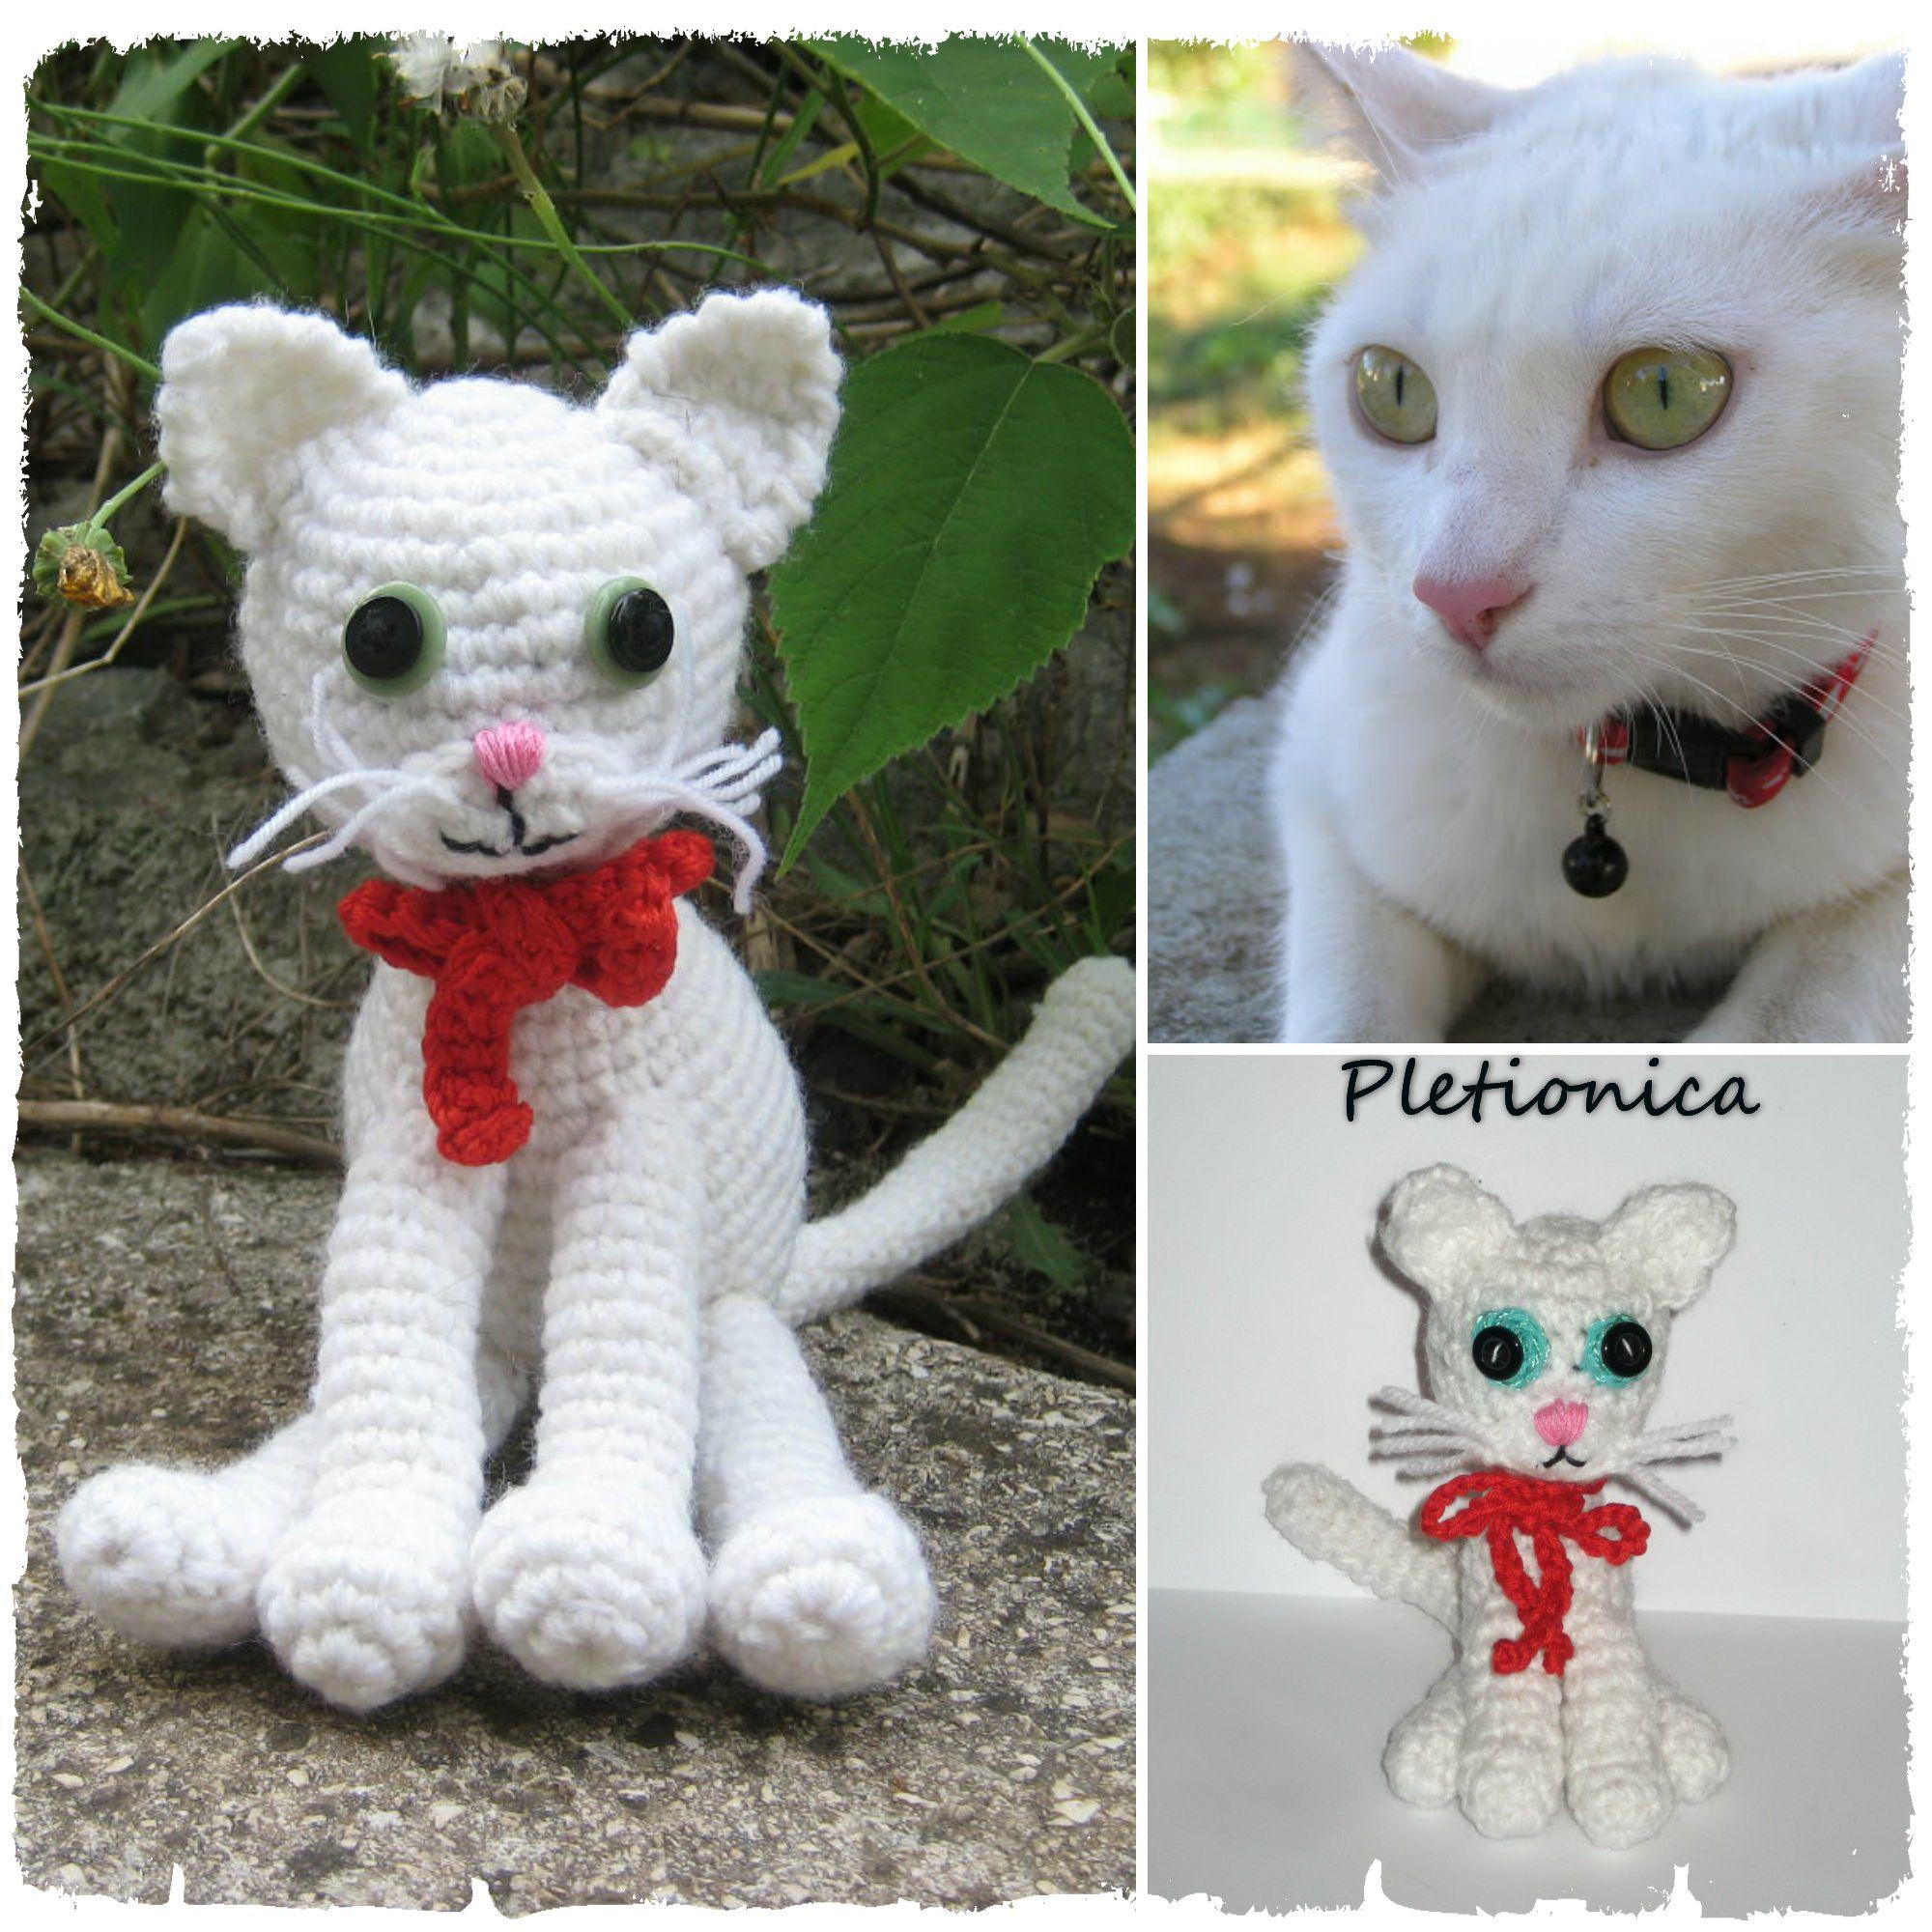 crochet cat keychain pattern - YouTube in 2020 | Cat amigurumi ... | 2000x2000